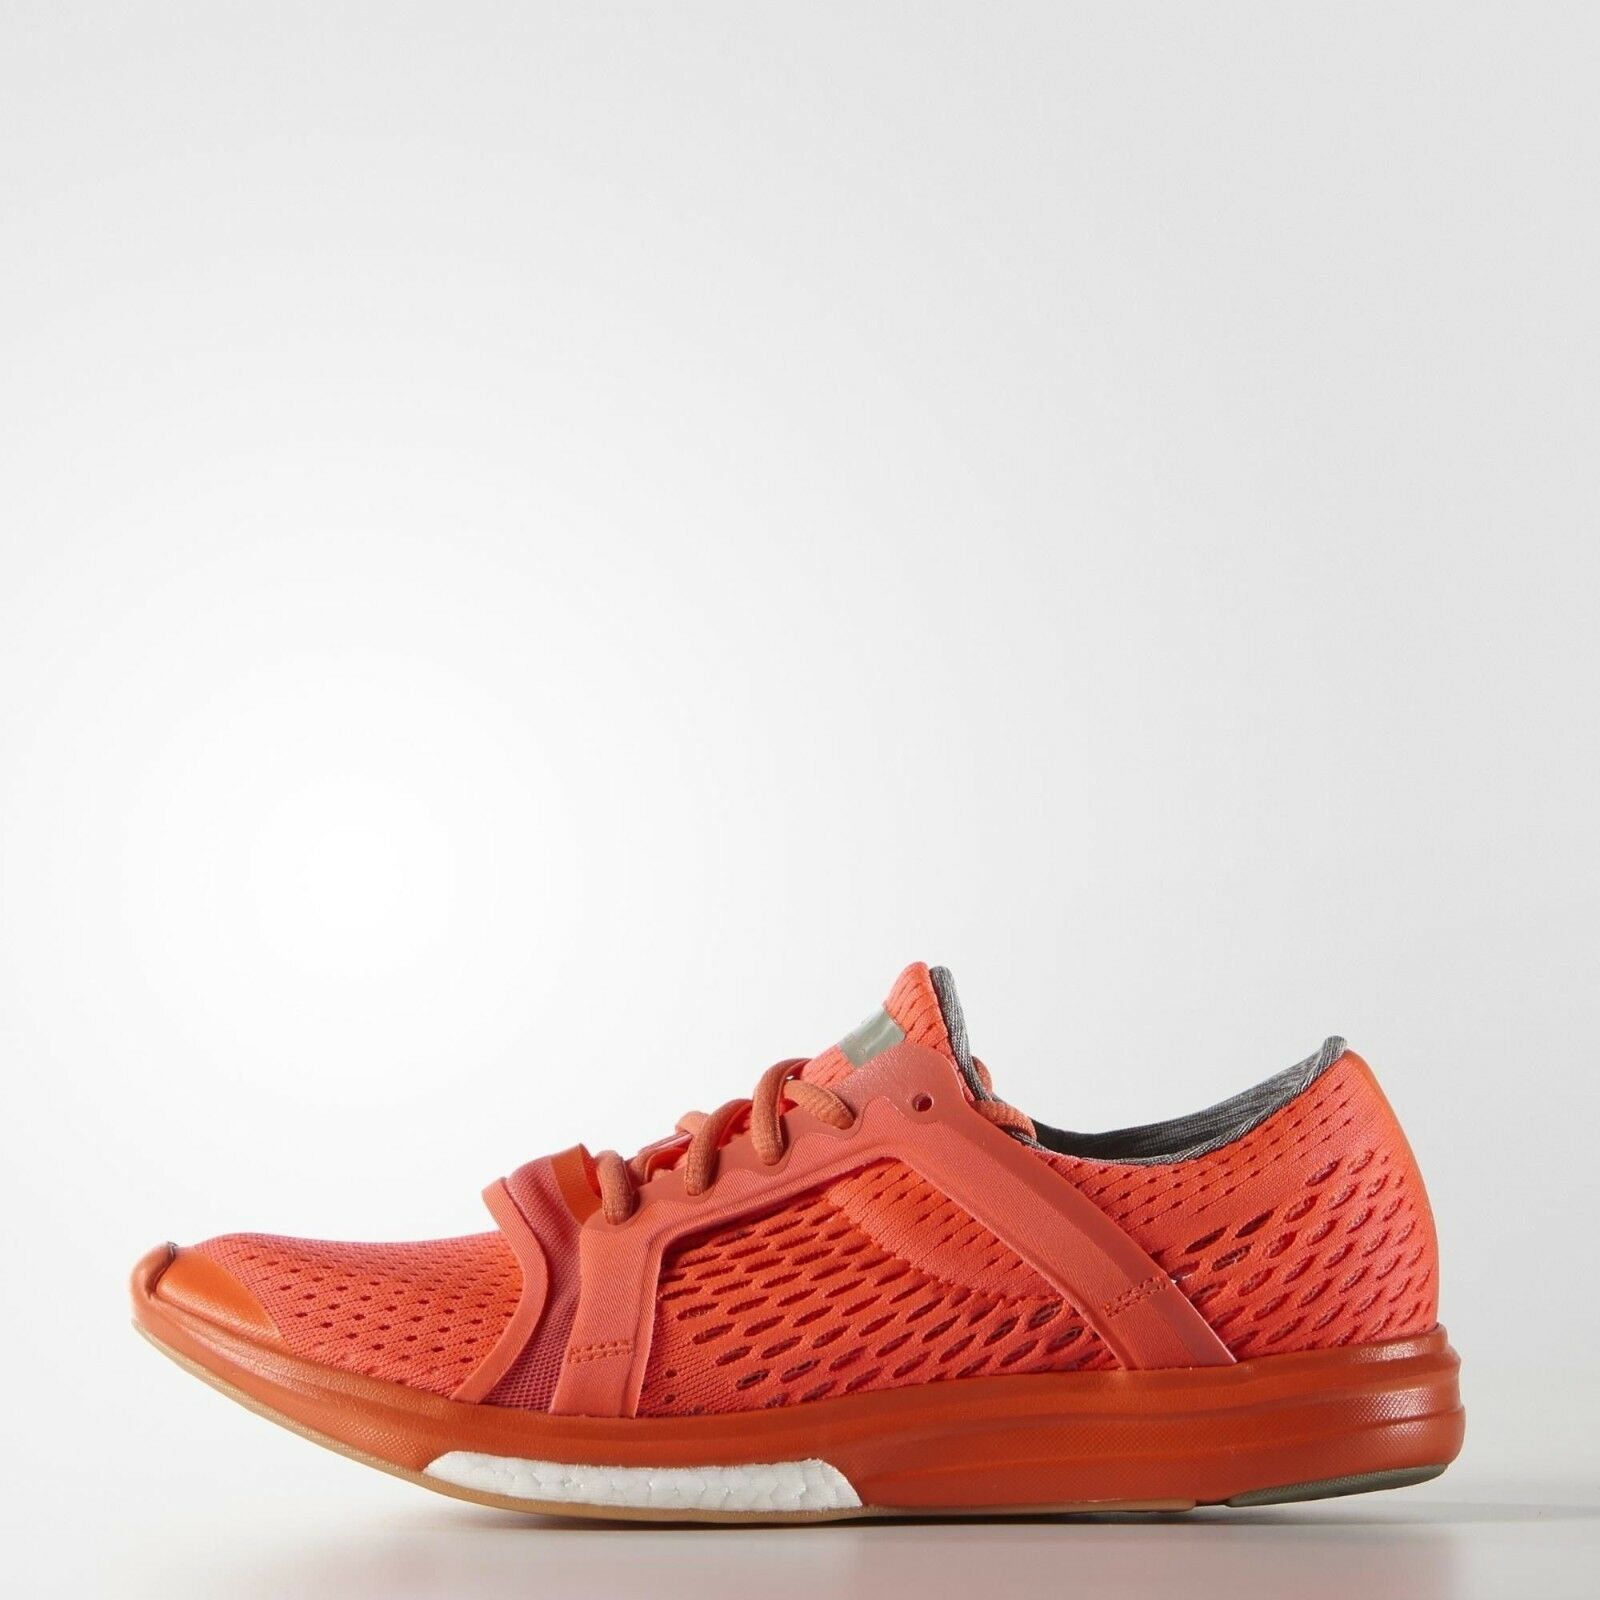 Adidas Stella McCartney Climacool Sonic Sz 8.5 Running B25115 Solar Red Coral